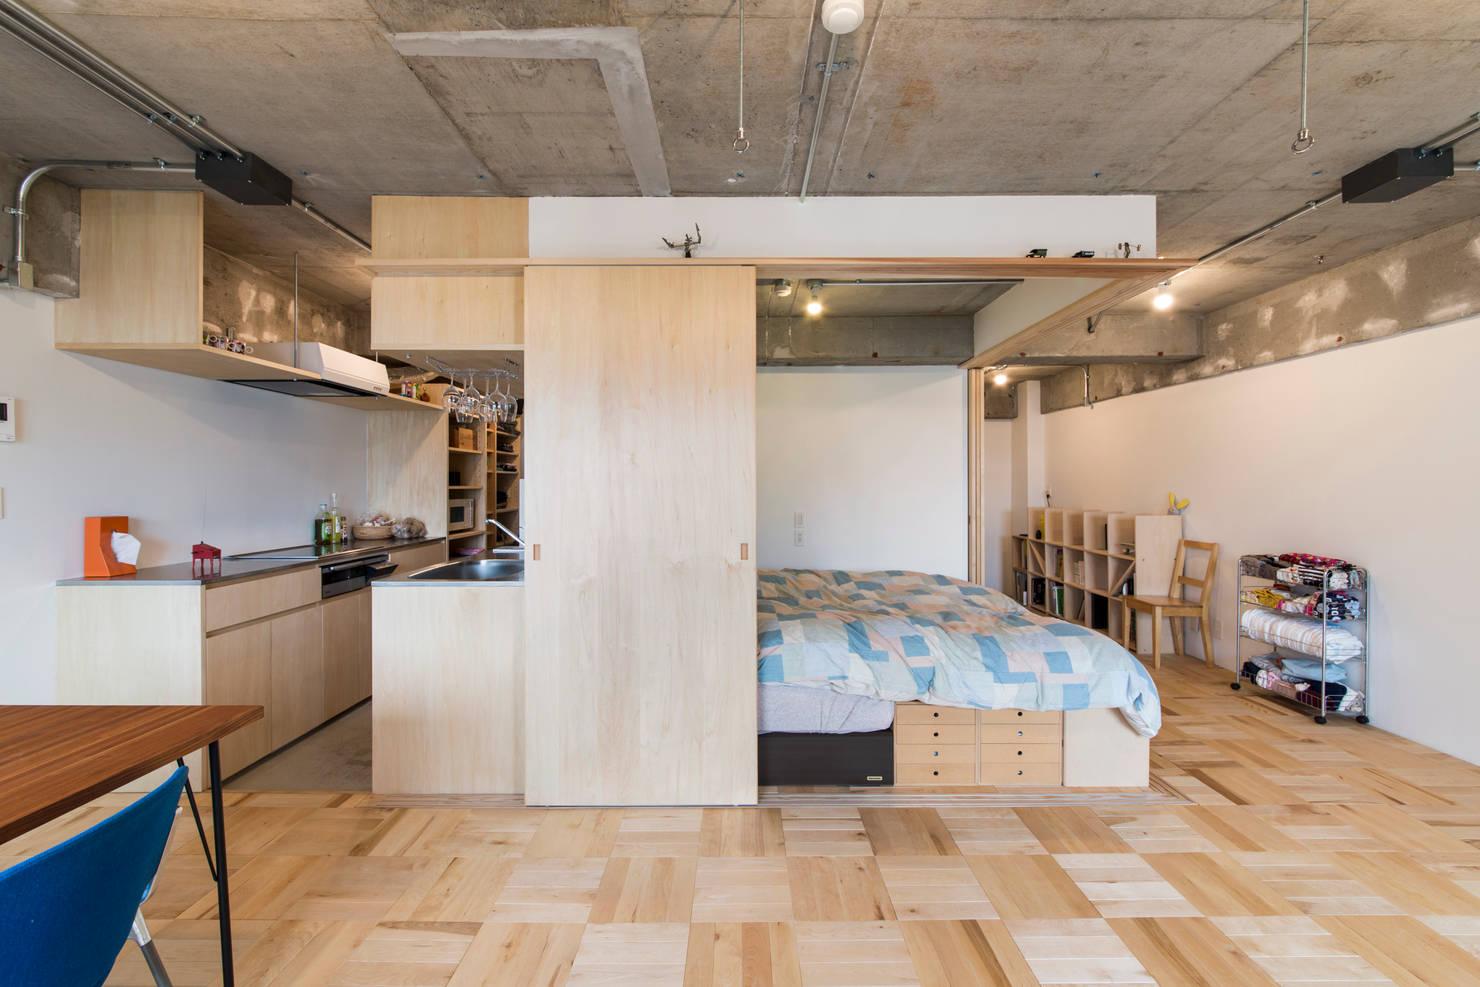 15 interior designs for those living alone